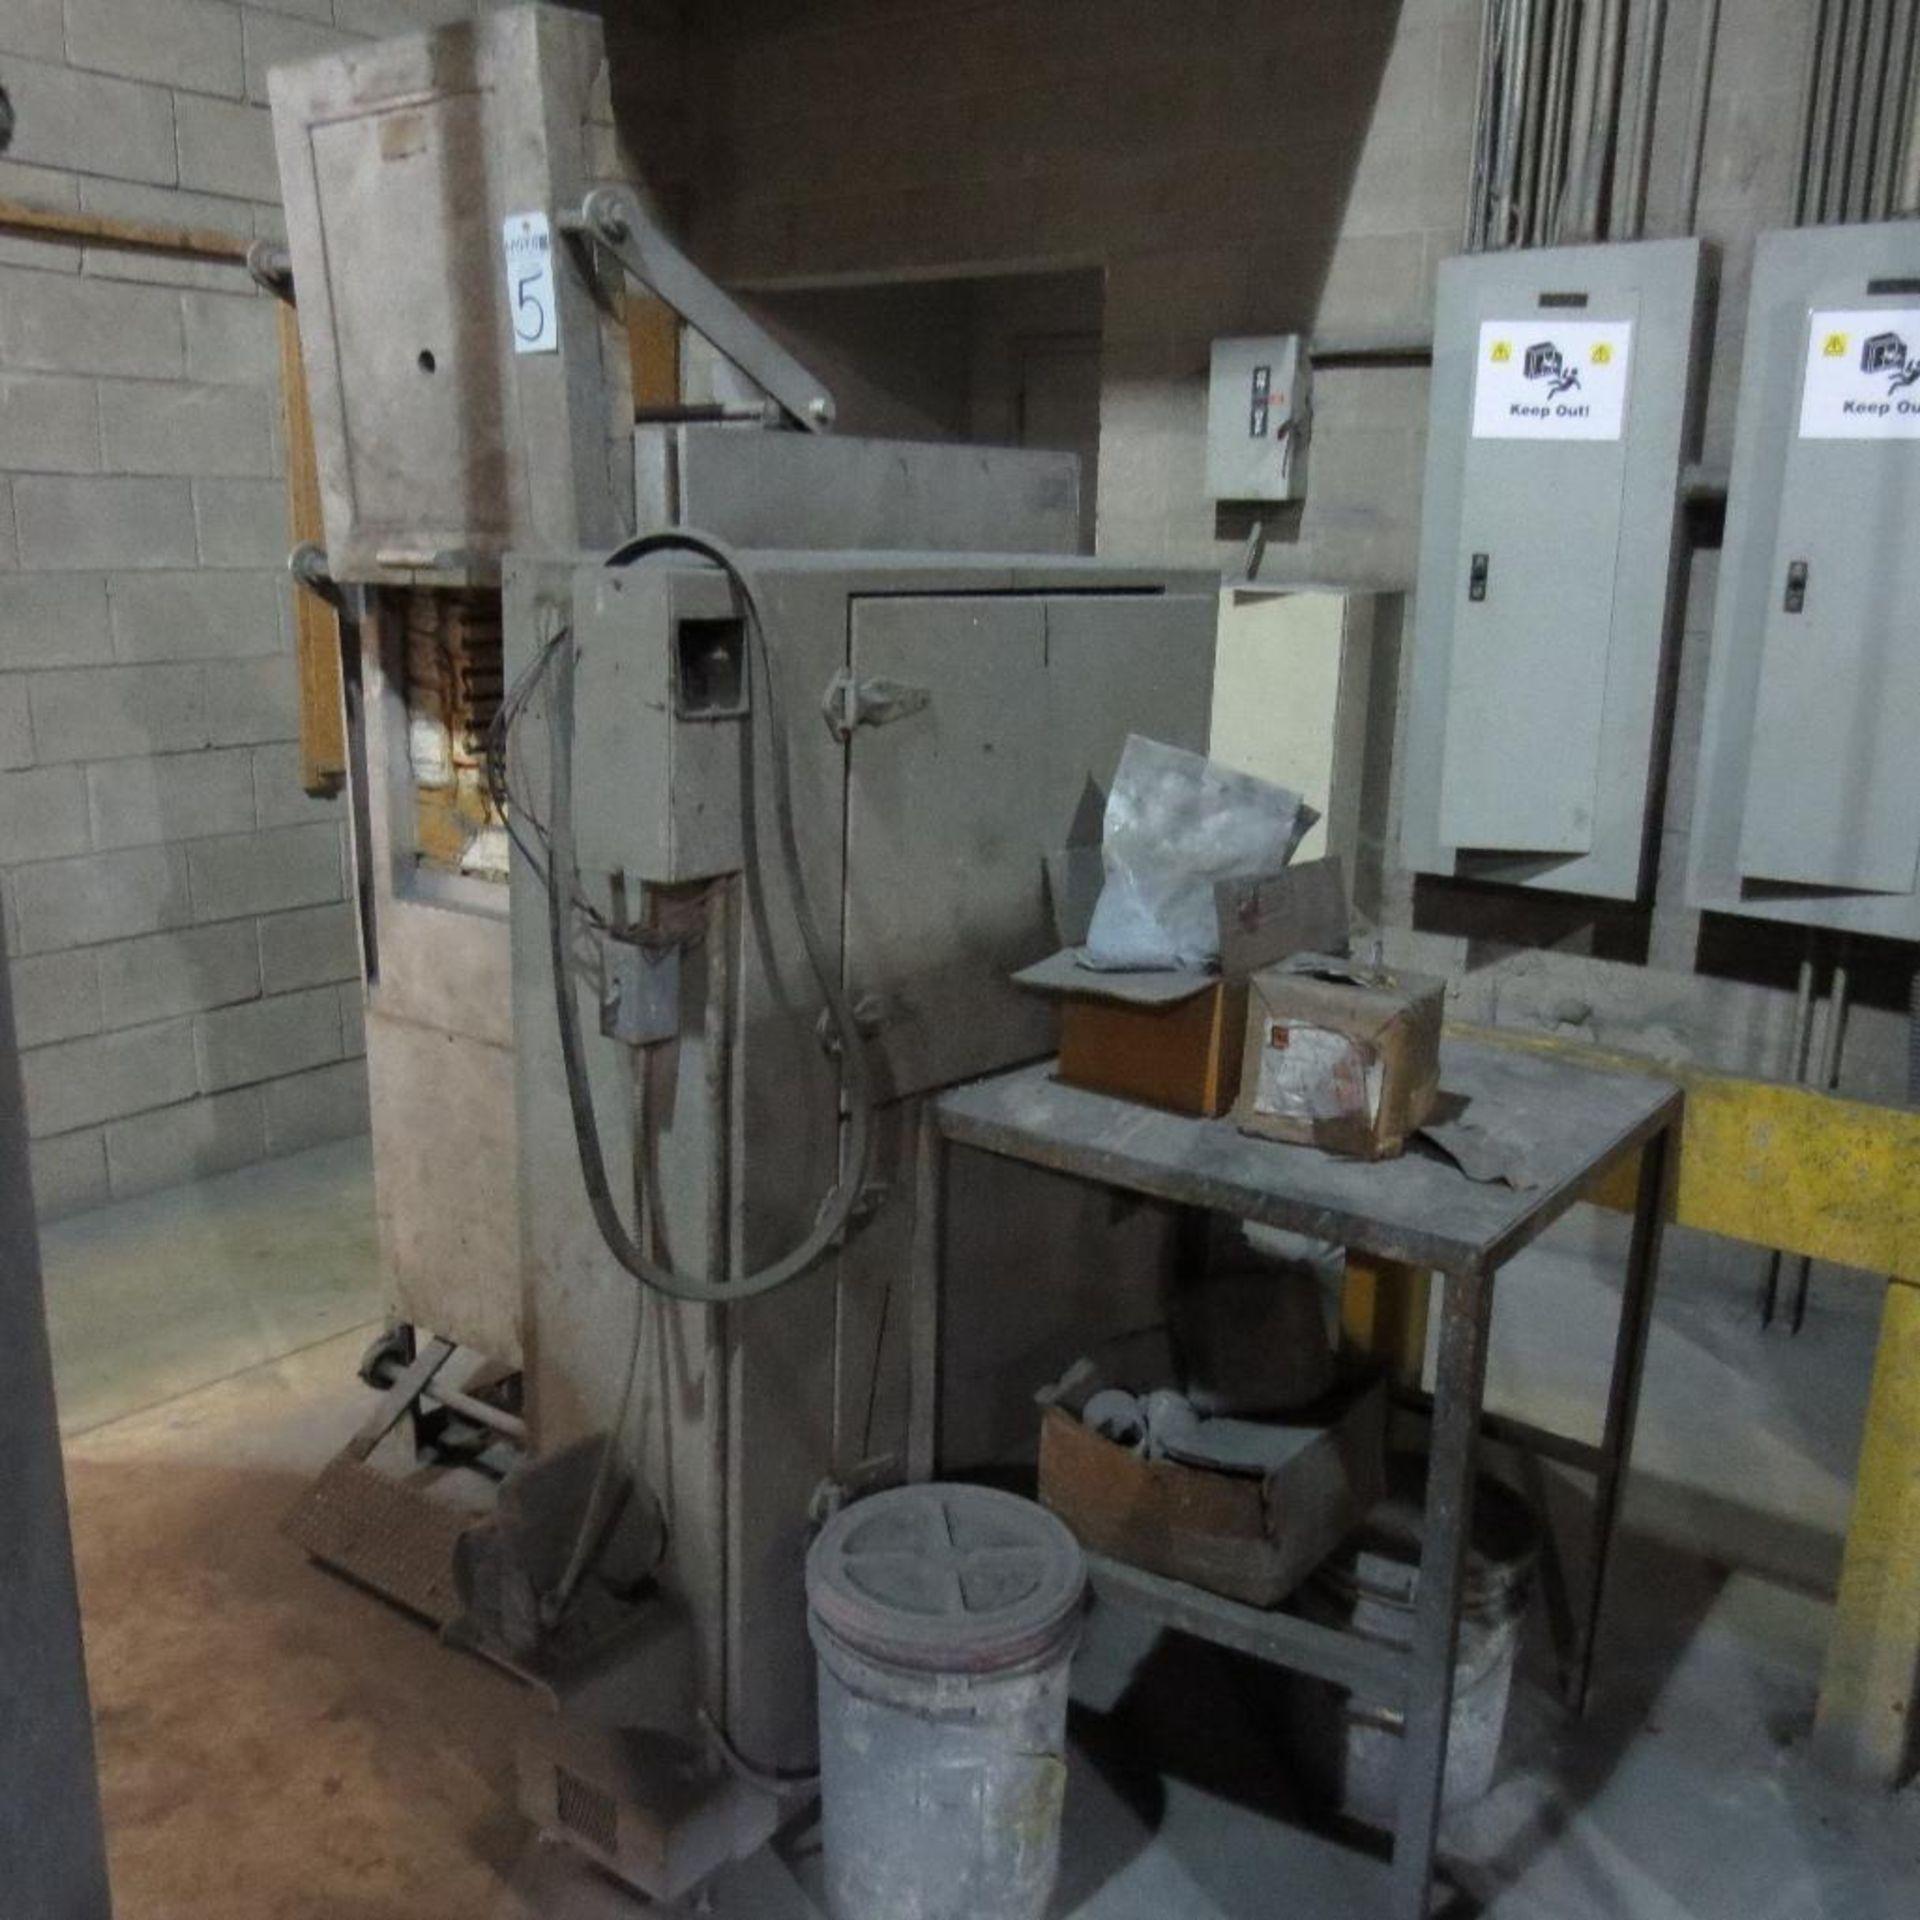 "Lot 5 - Ferro Enamels Model HT-2 10 KW Oven, 220 V, 3 PH, Apx. 11"" X 10"" Opening with Ferro Dryer"